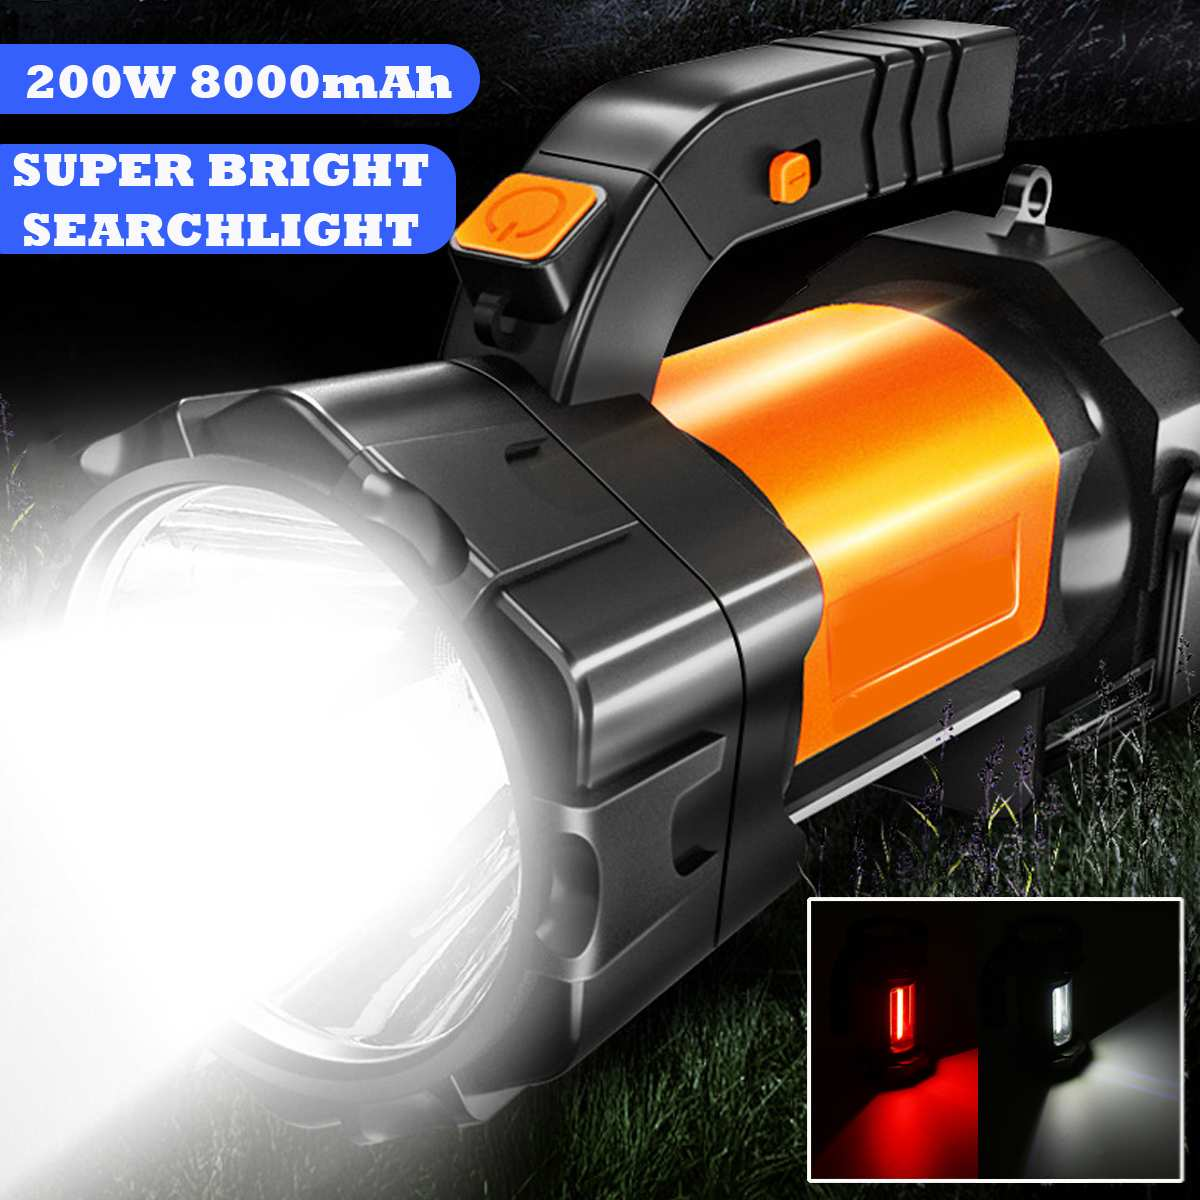 200W 2000LM Handheld Spotlight Portable USB Built-in Rechargeable LED Searchlight Lantern Flashlight Waterproof Spot Lamp